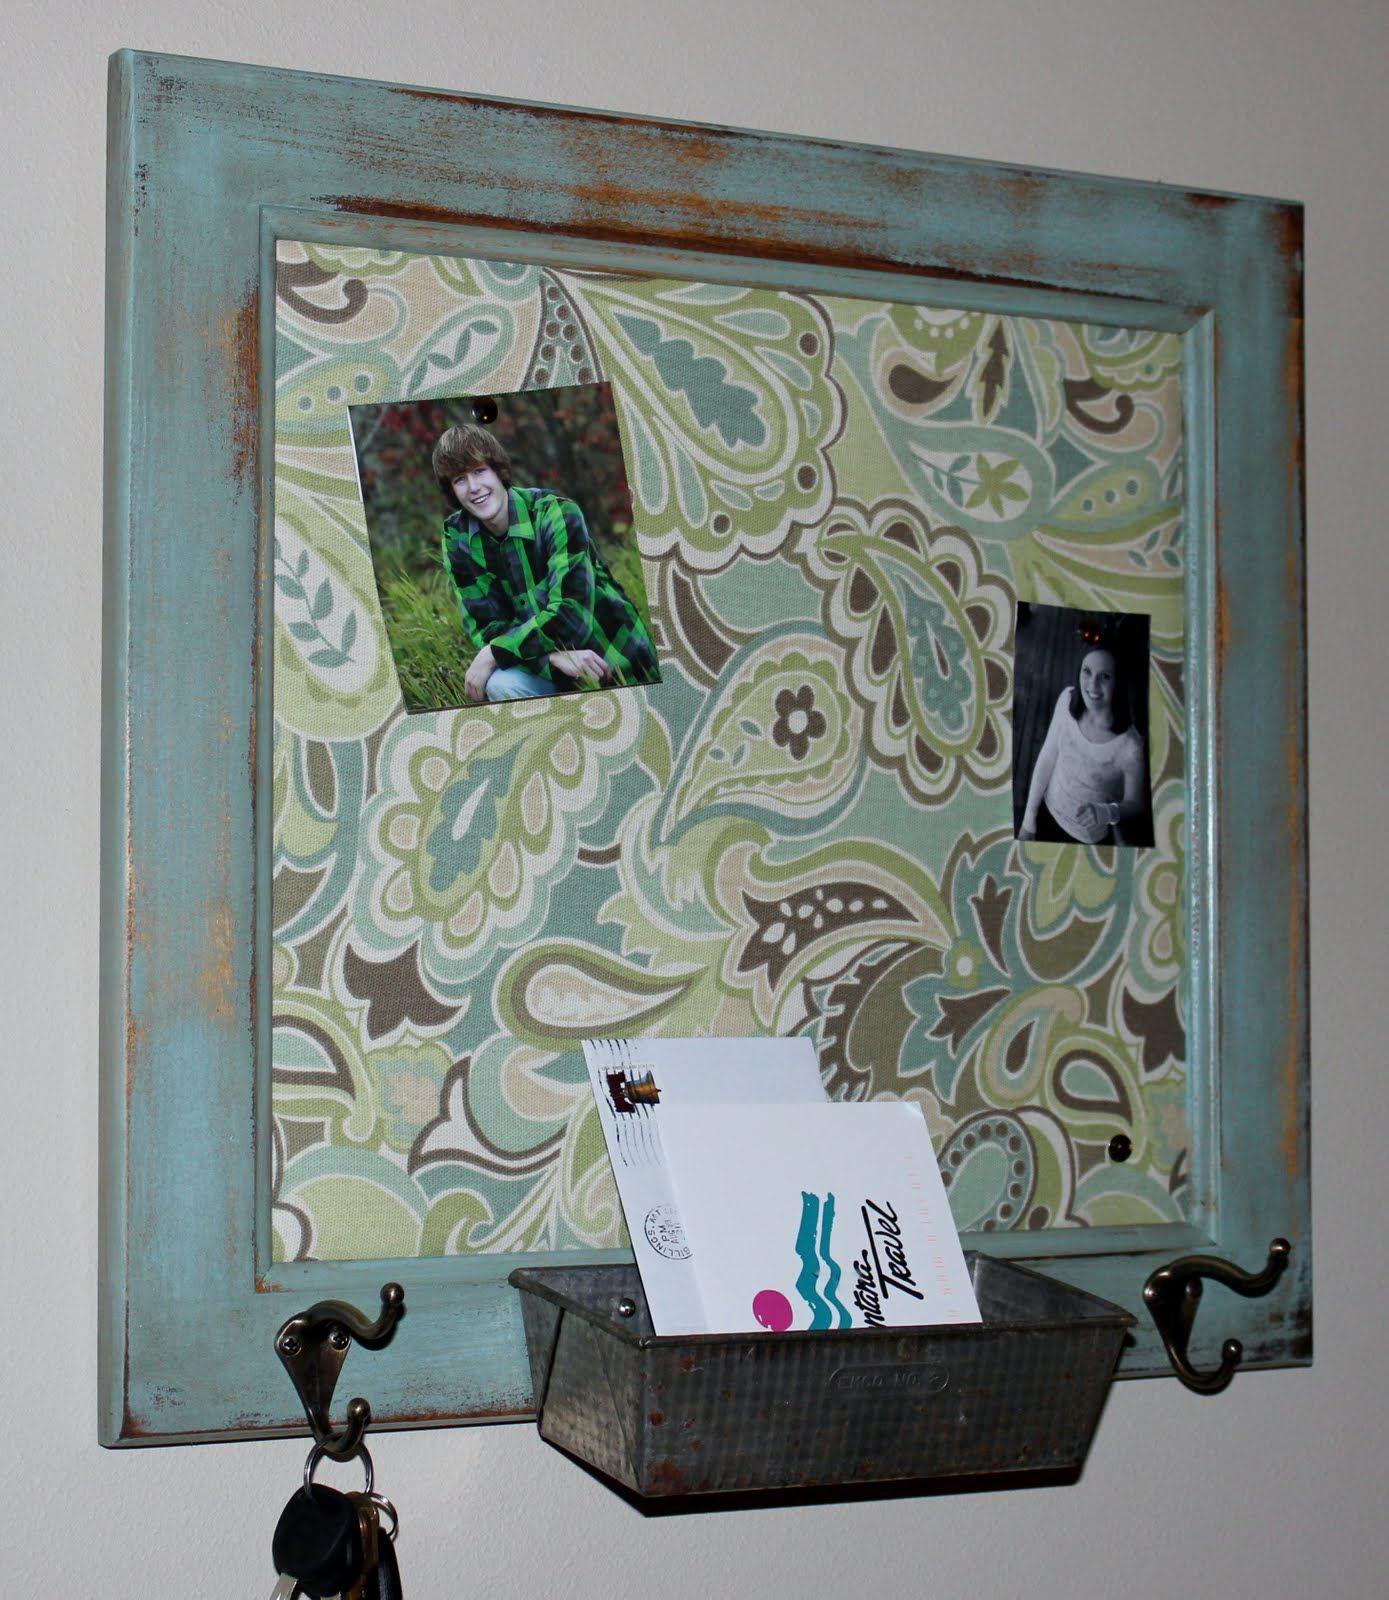 100+ Ways To Use Old Doors U2013 Page 5 U2013 Remodelaholic Pictures